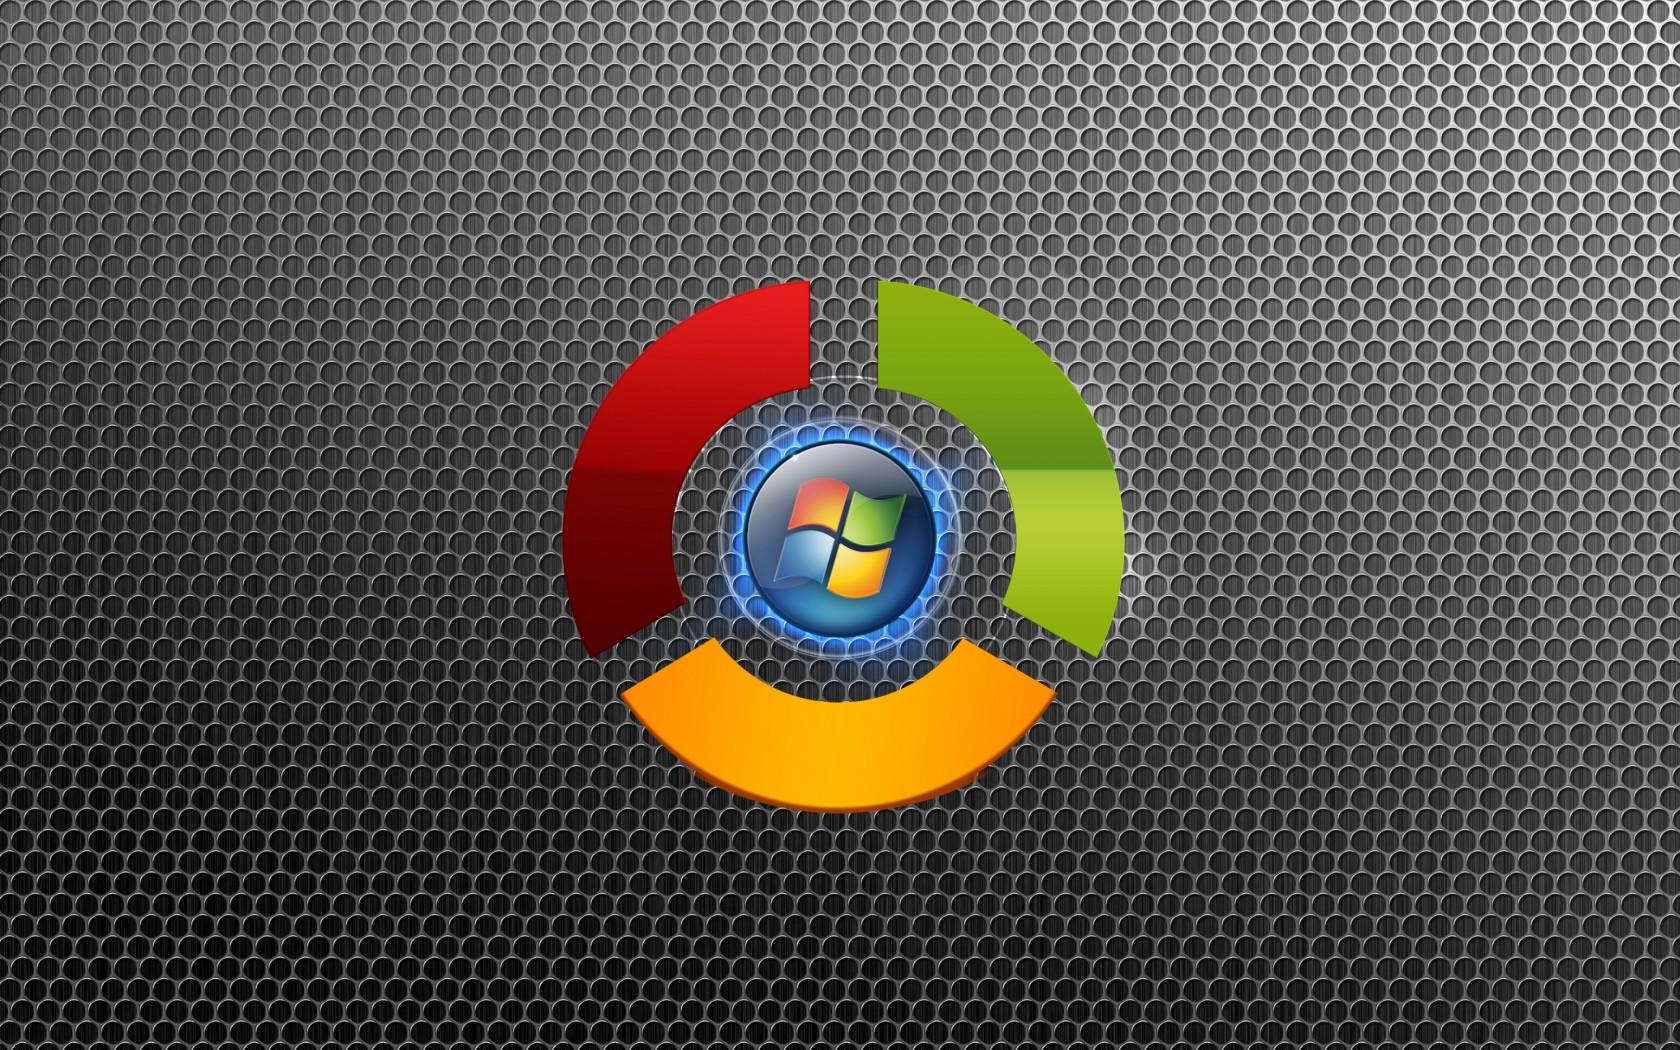 Desktop Wallpaper 171 – Hi tech Windows